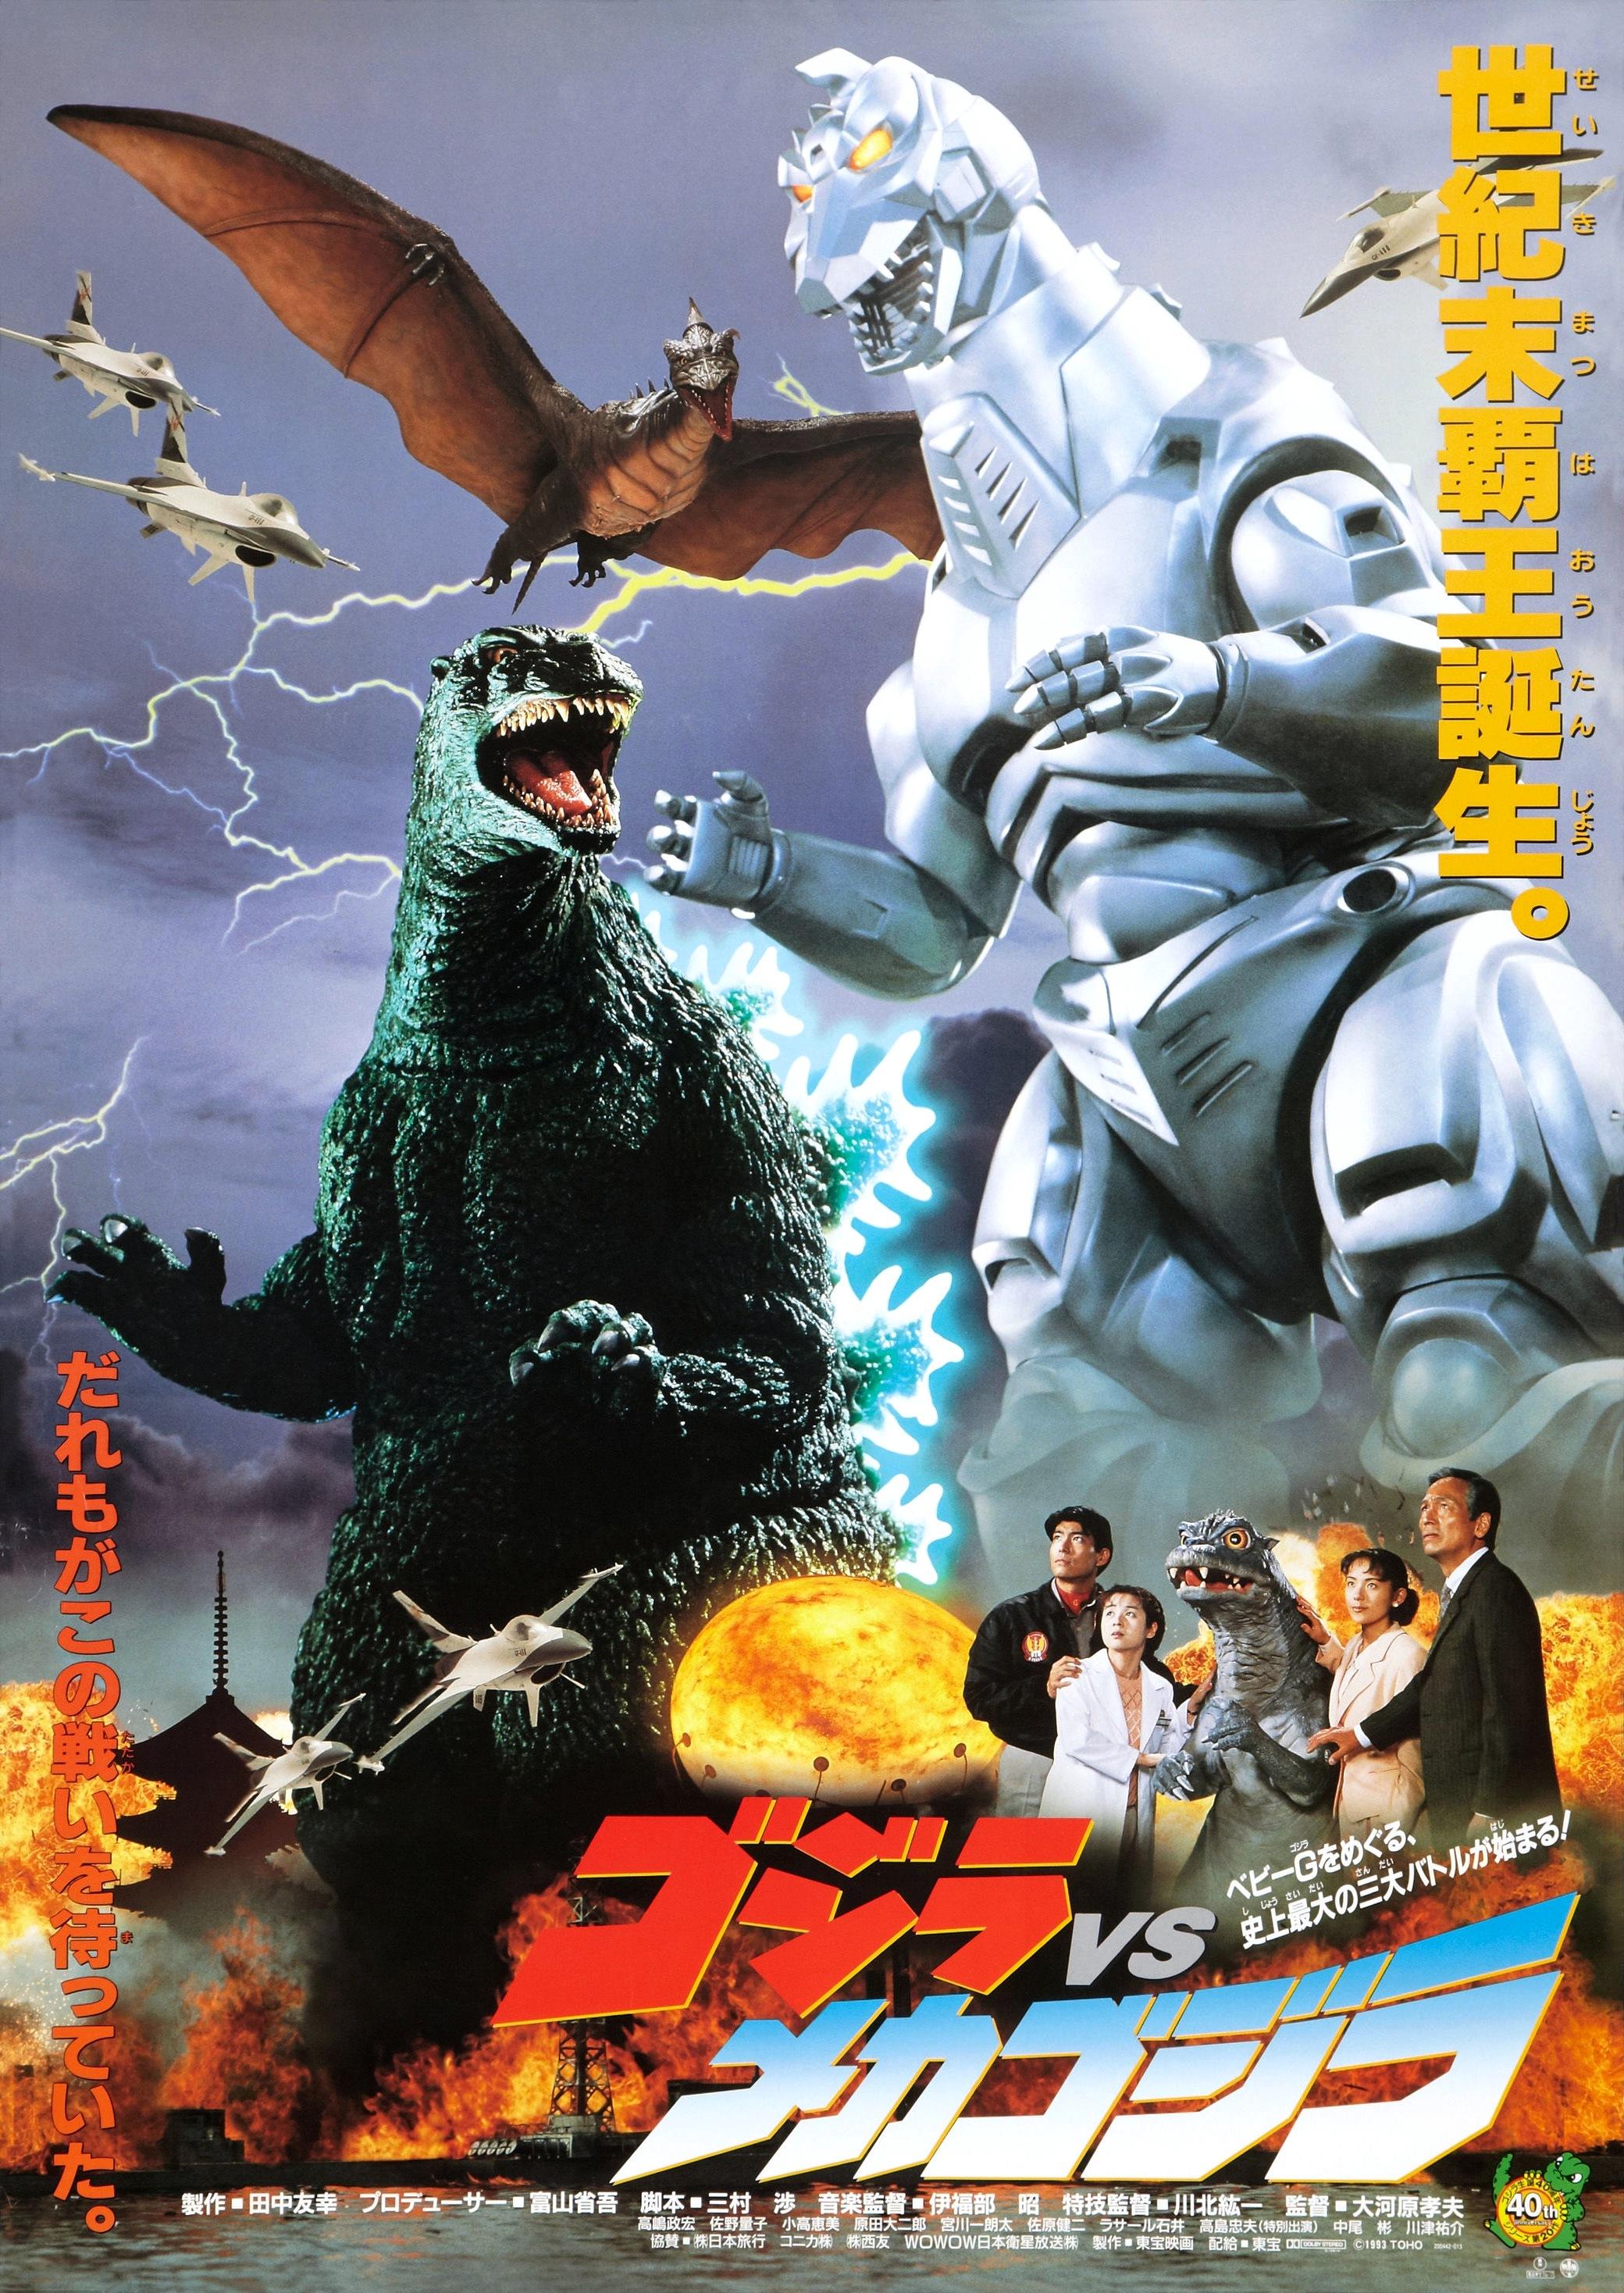 Trump vs Trumpmechanik Godzilla-vs-mechagodzilla-movie-poster-1020433270